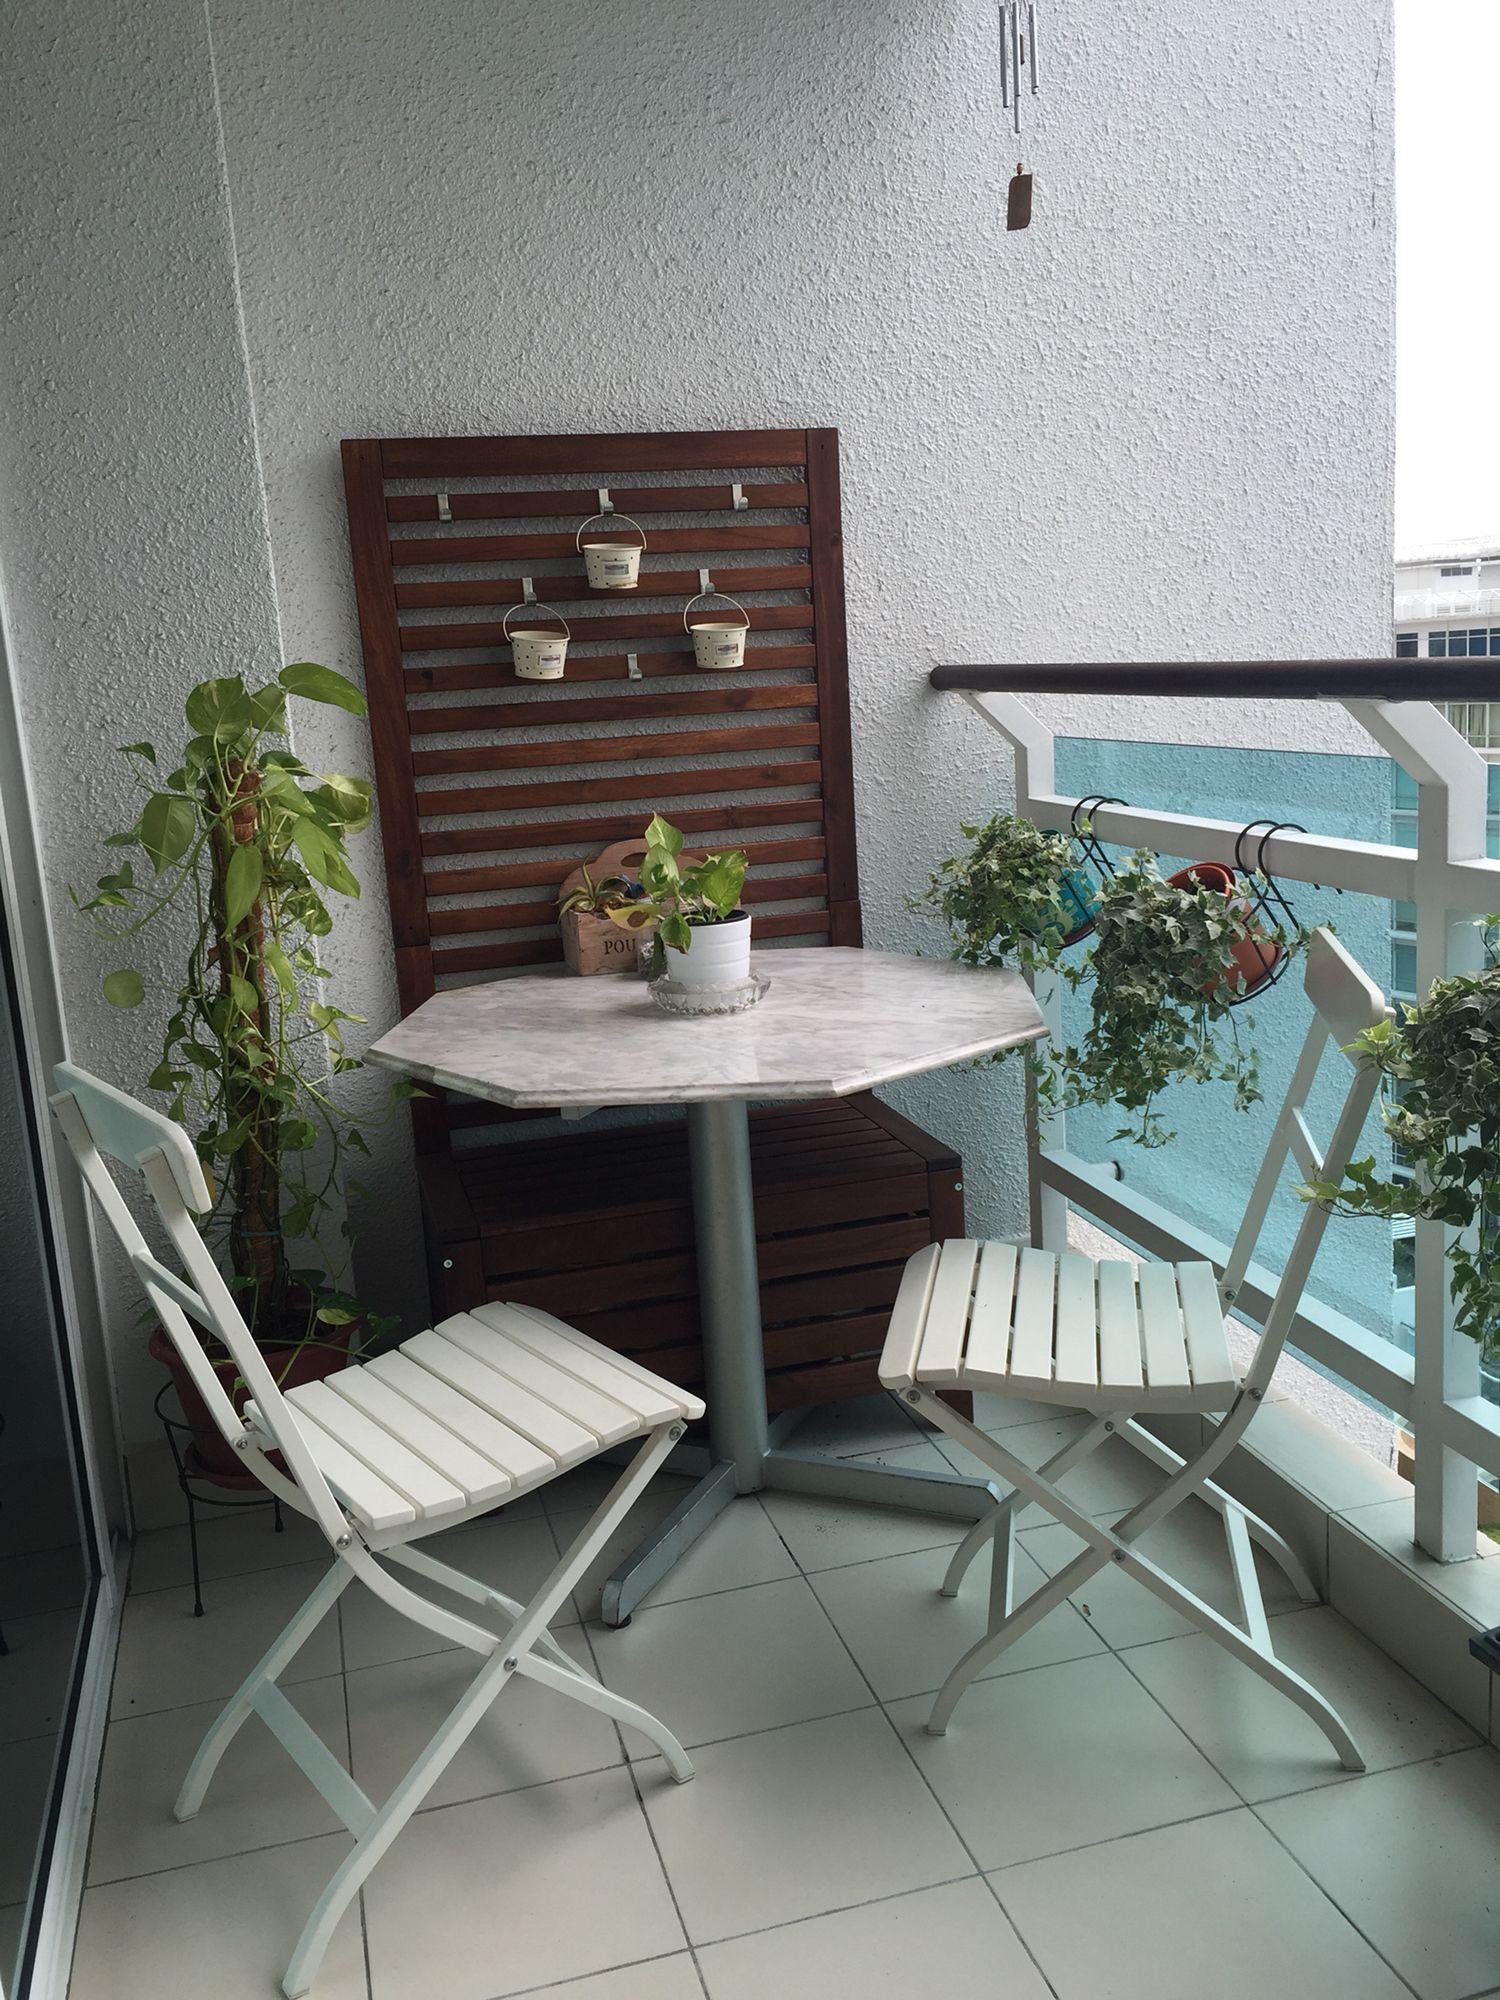 IKEA Applaro bench and wall panel and IKEA Malaro chairs